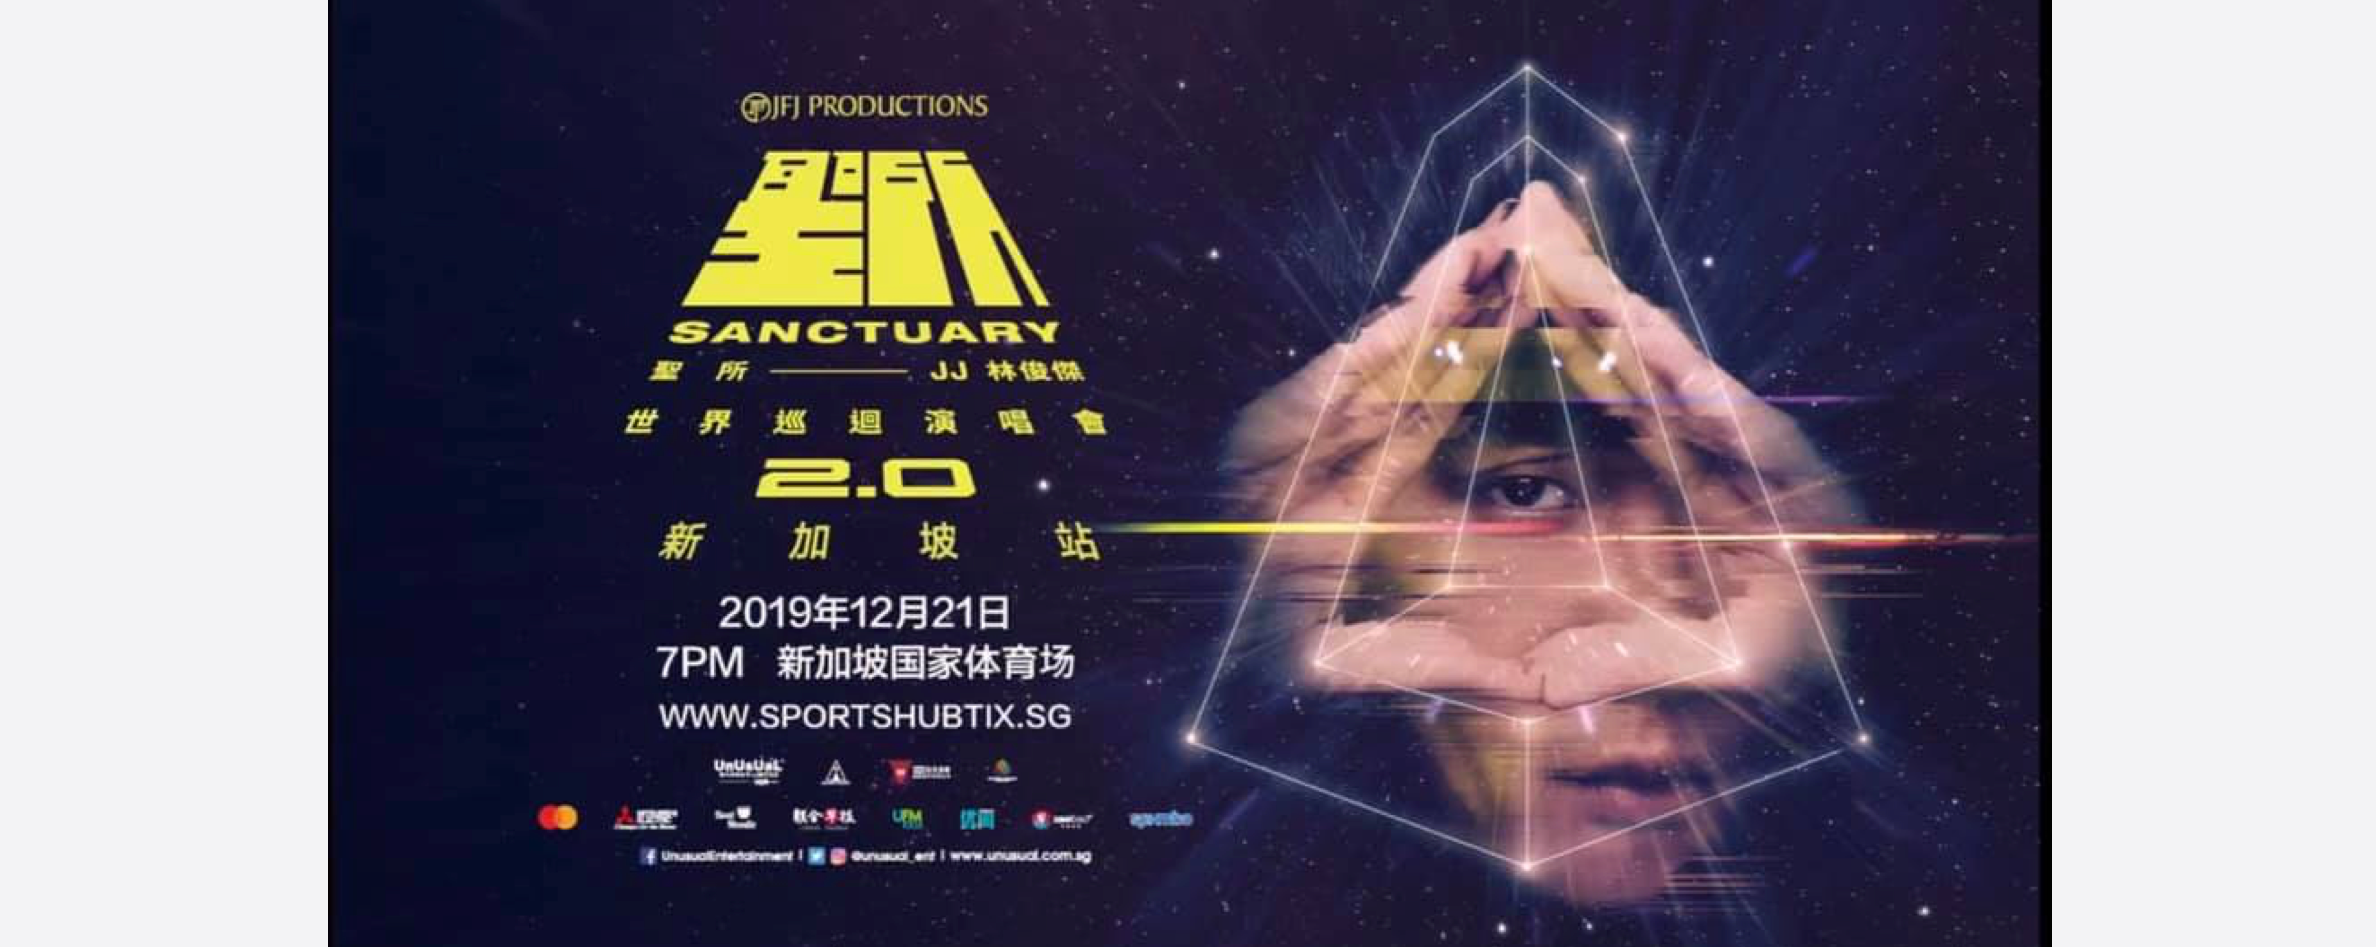 JJ林俊杰世界巡回演唱会 圣所2.0 新加坡站 JJ Lin Sanctuary 2.0 World Tour - SG